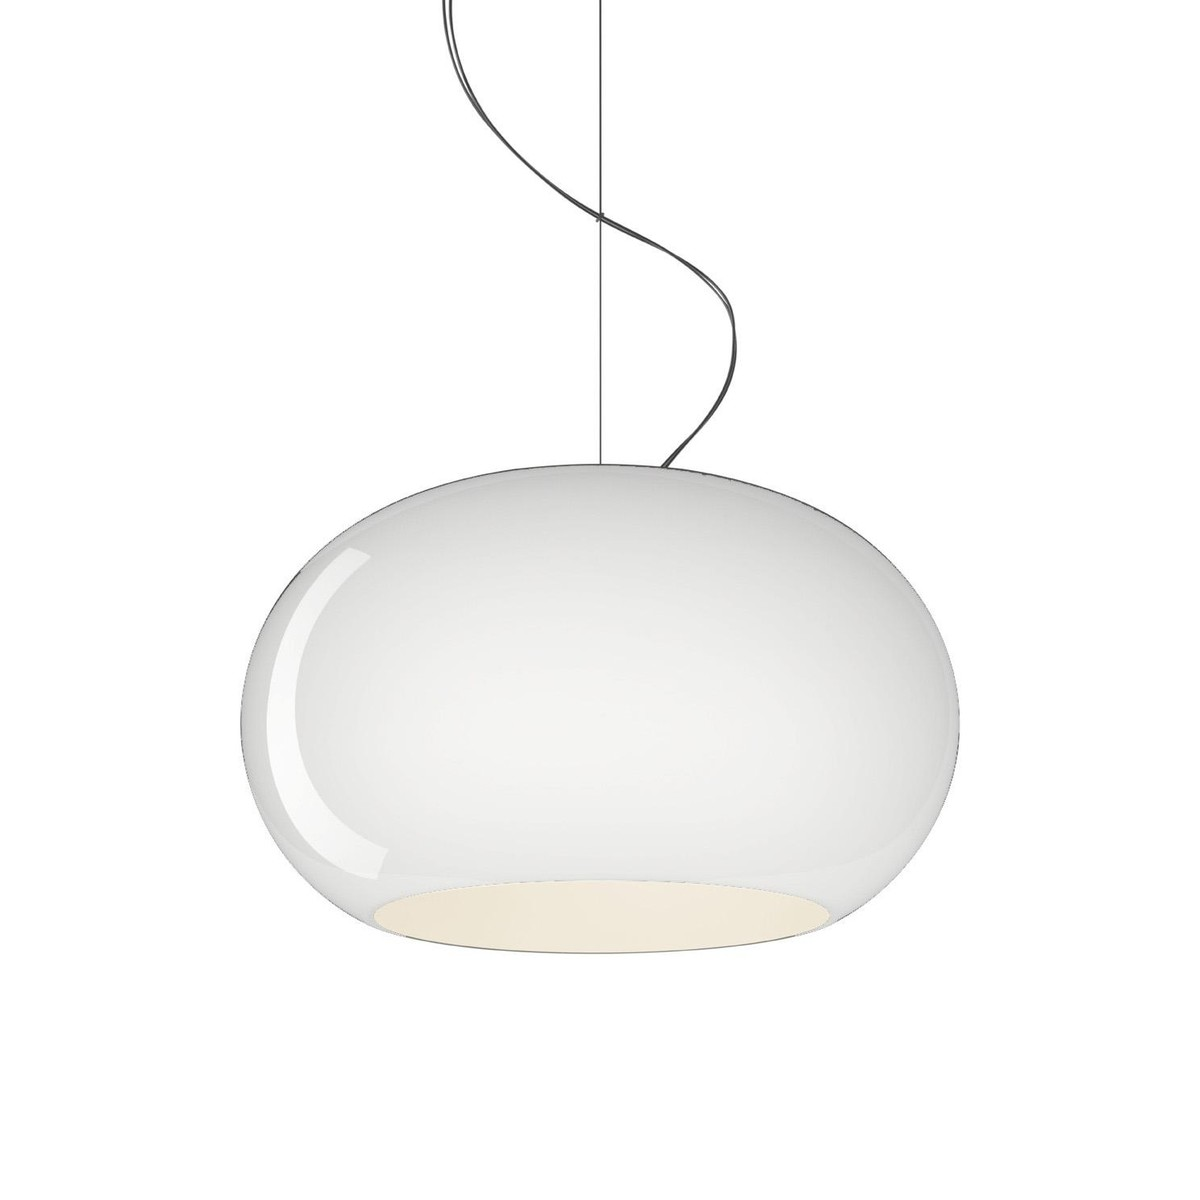 Buds 2 Lámpara colgante sin florón cable 5 metros E27 1x23W Blanco cálido